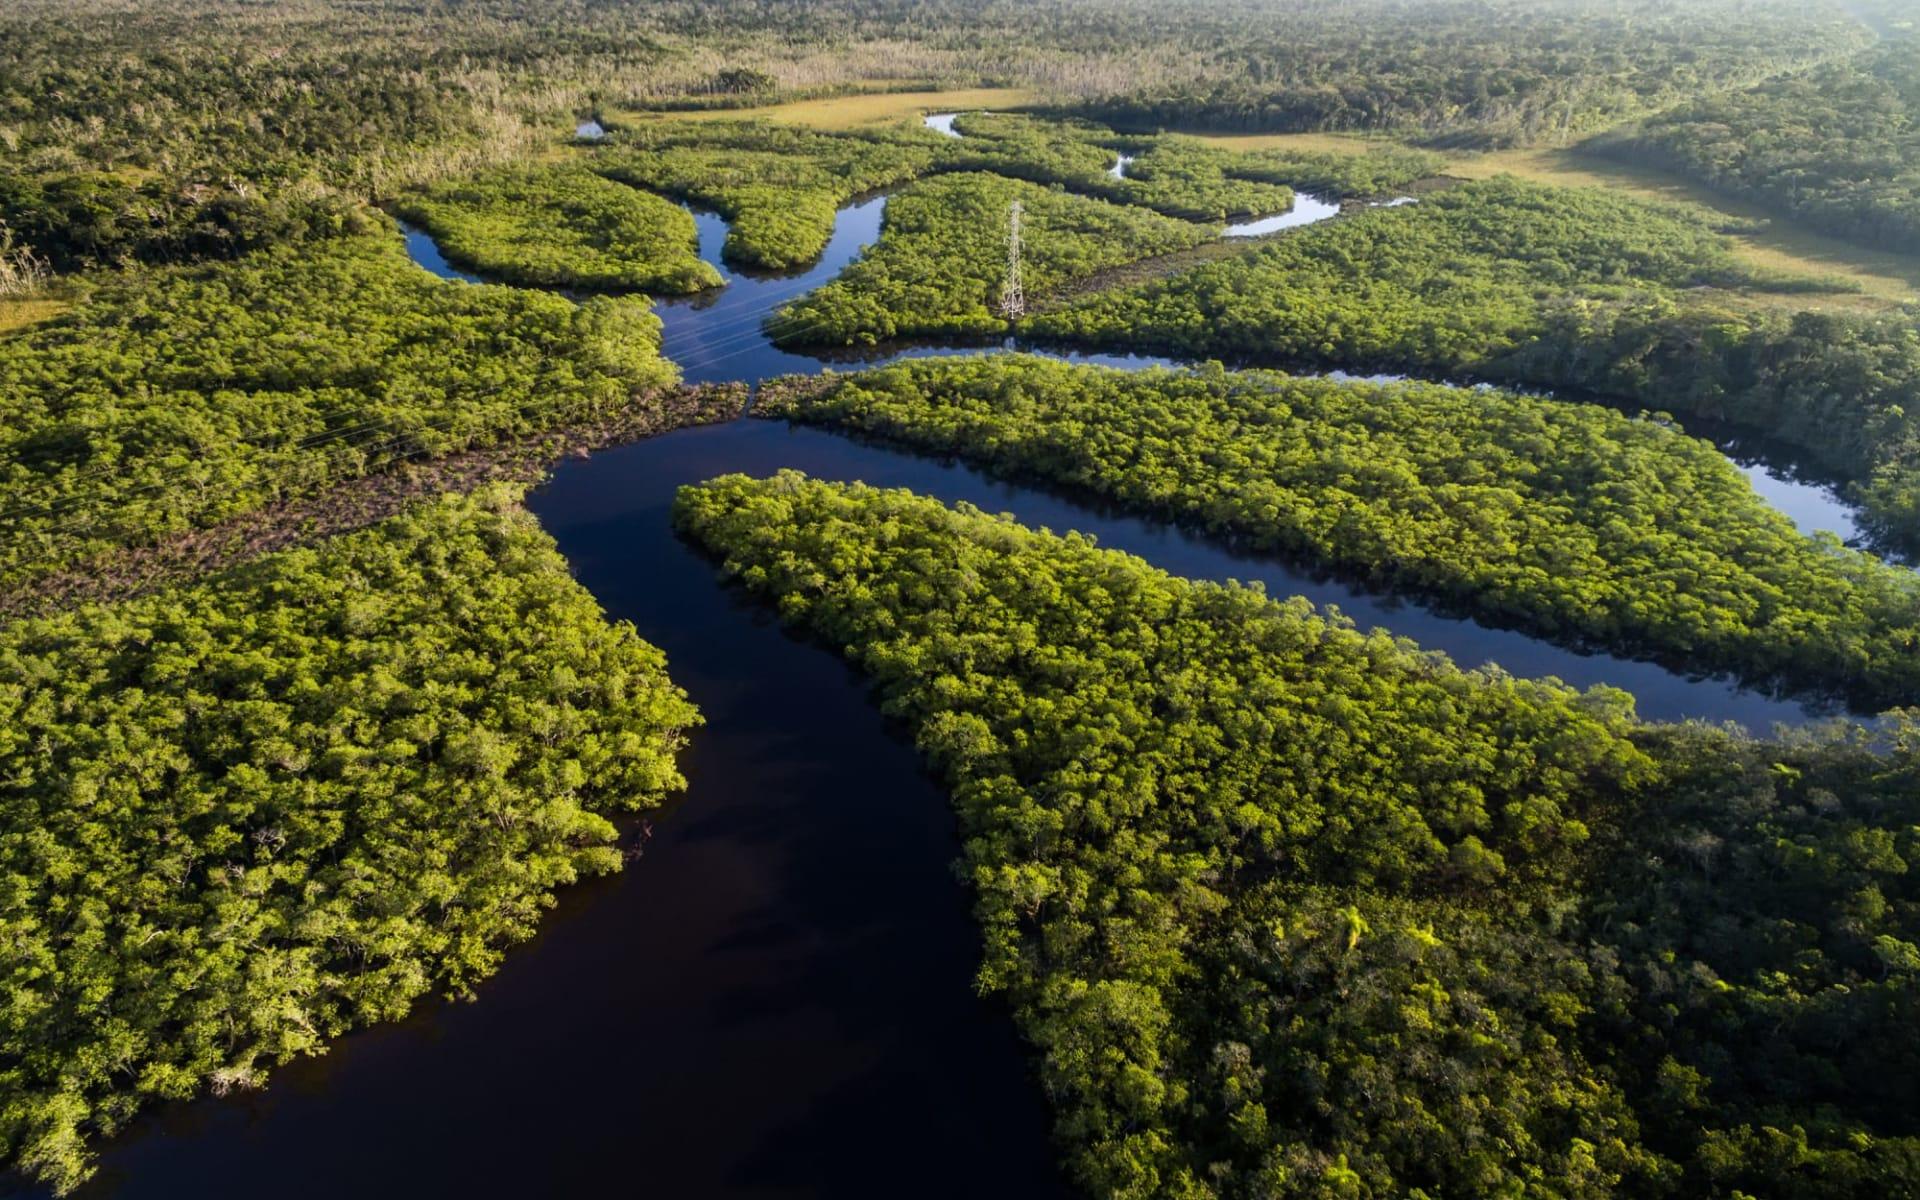 Iberostar / Rio Negro Programm ab Manaus: Brasilien - Amazonas - Fluss Vogelperspektive